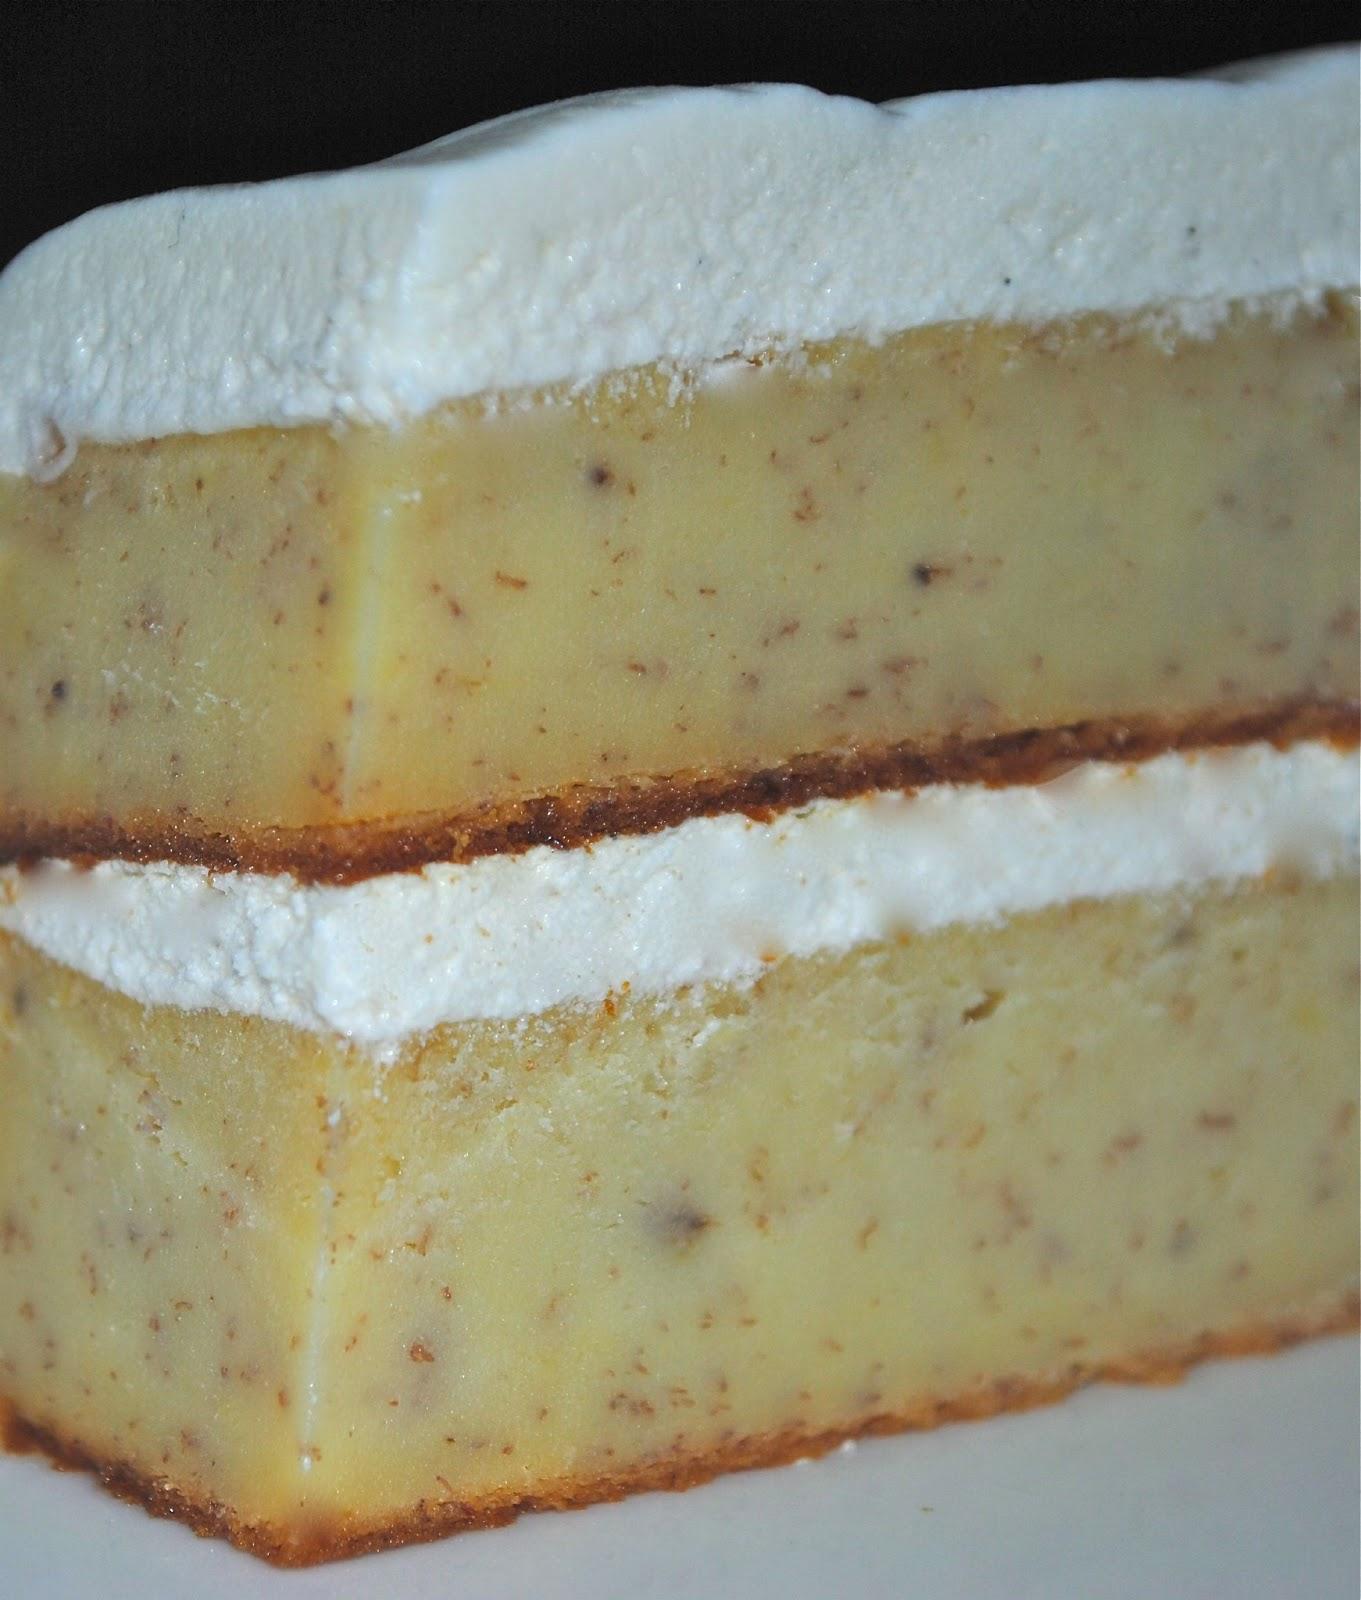 Sour Cream Banana Cake With Caramel Icing